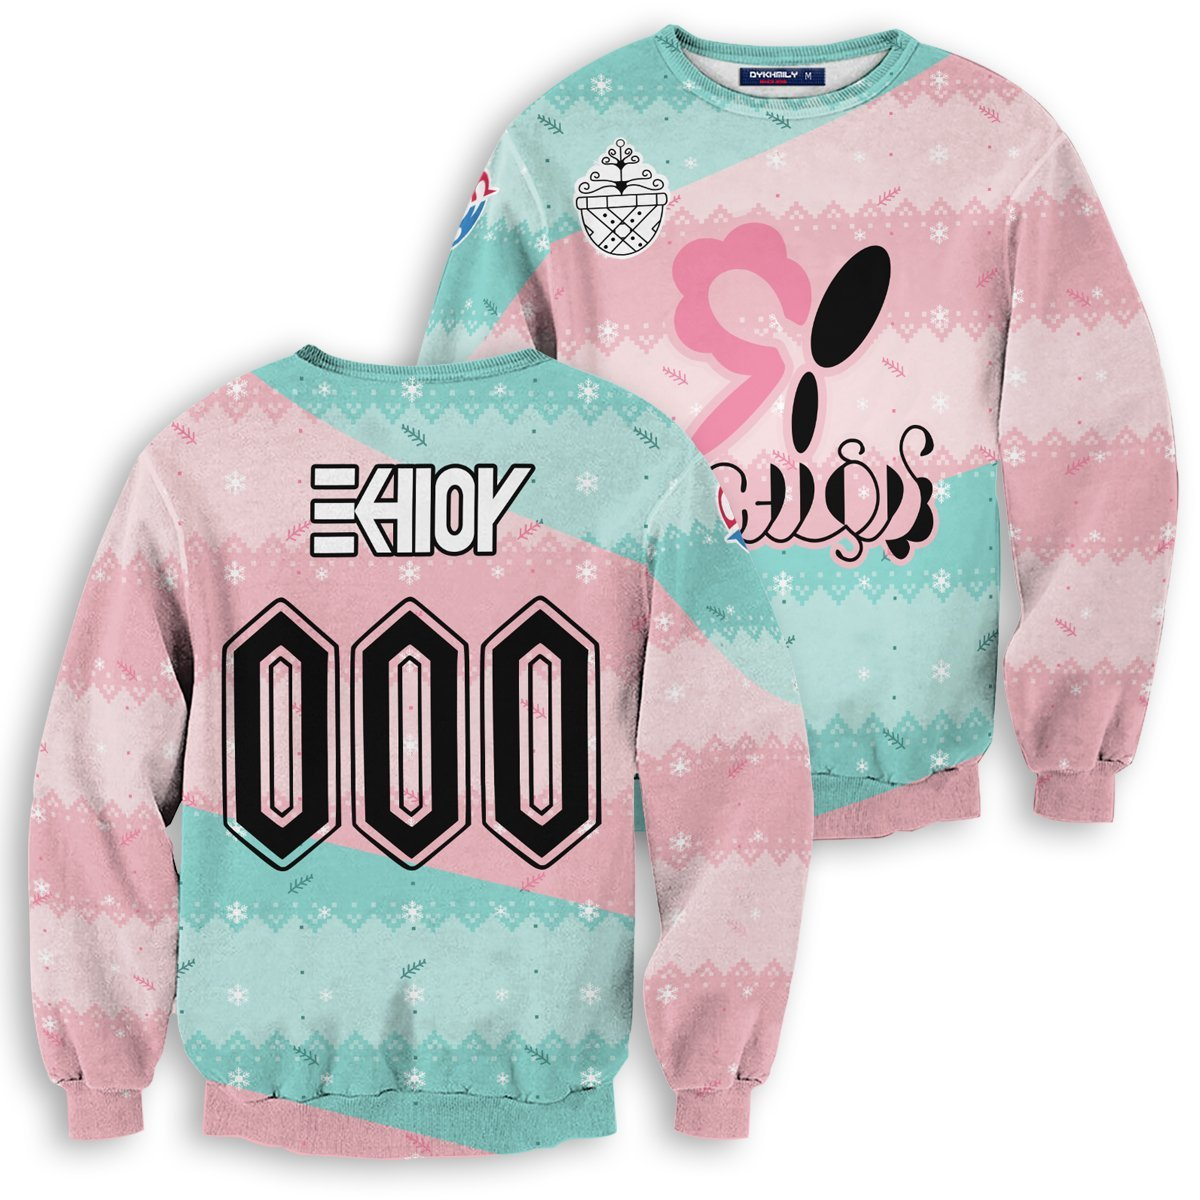 Personalized Pokemon Fairy Uniform Unisex Wool Sweater FDM0310 S Official Otaku Treat Merch